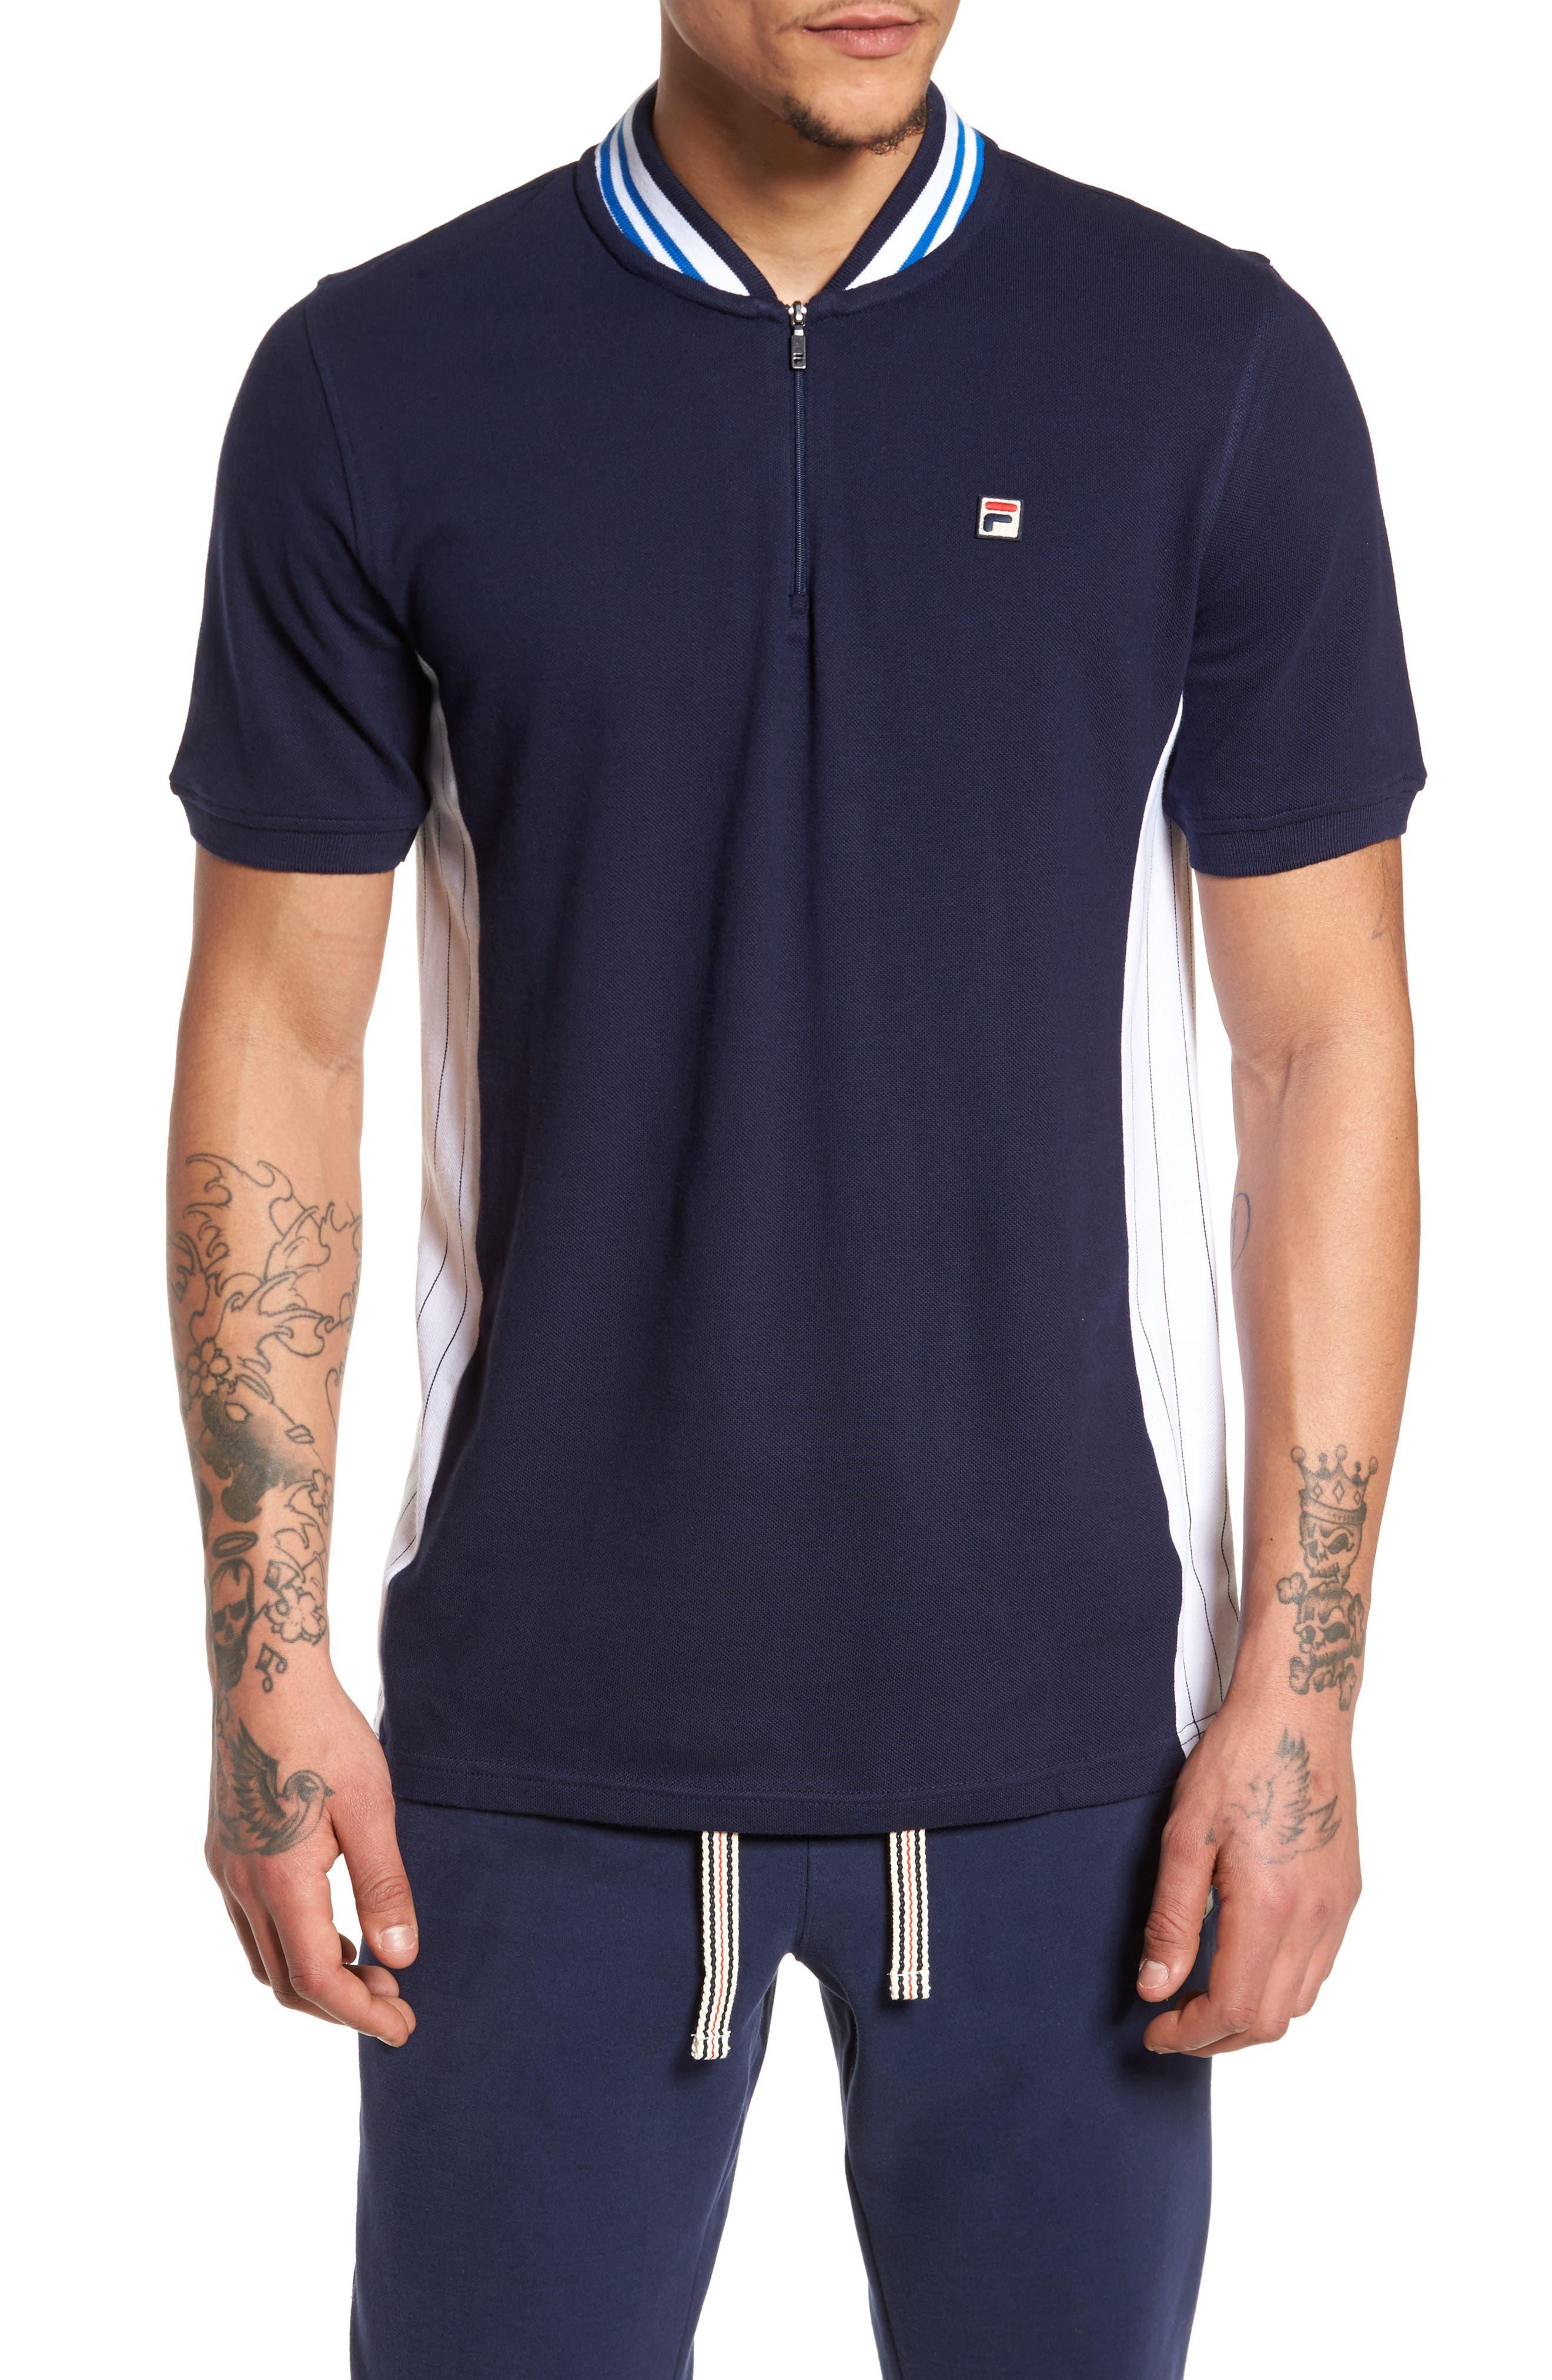 Moretti Short Sleeve Zip Henley Shirt,                             Main thumbnail 1, color,                             001